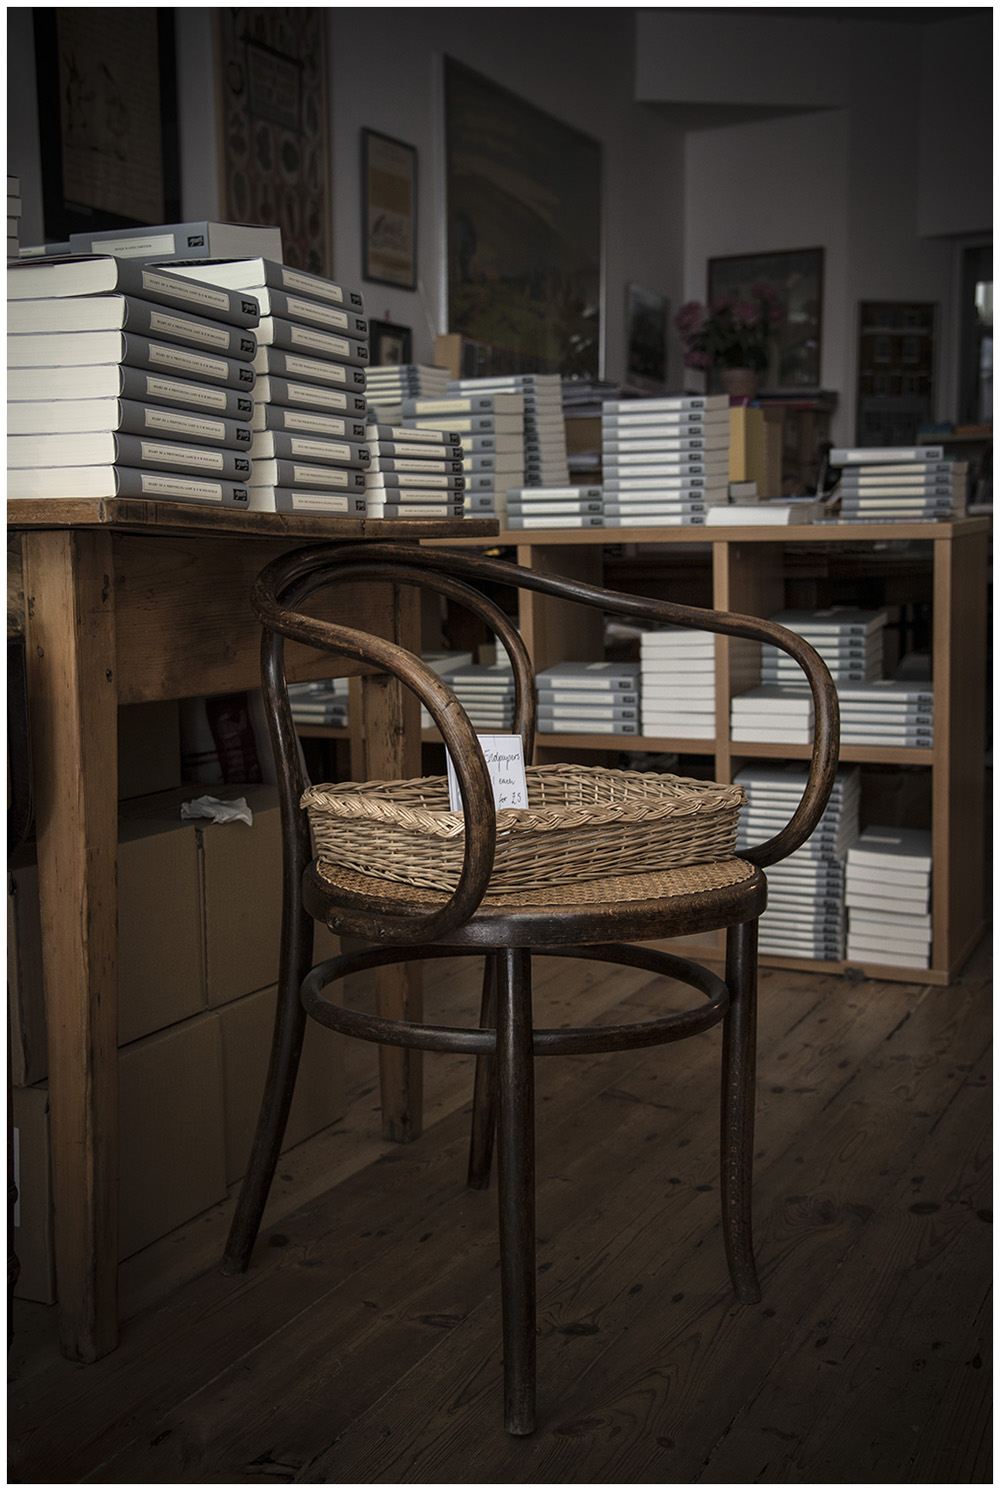 Persephone Books London